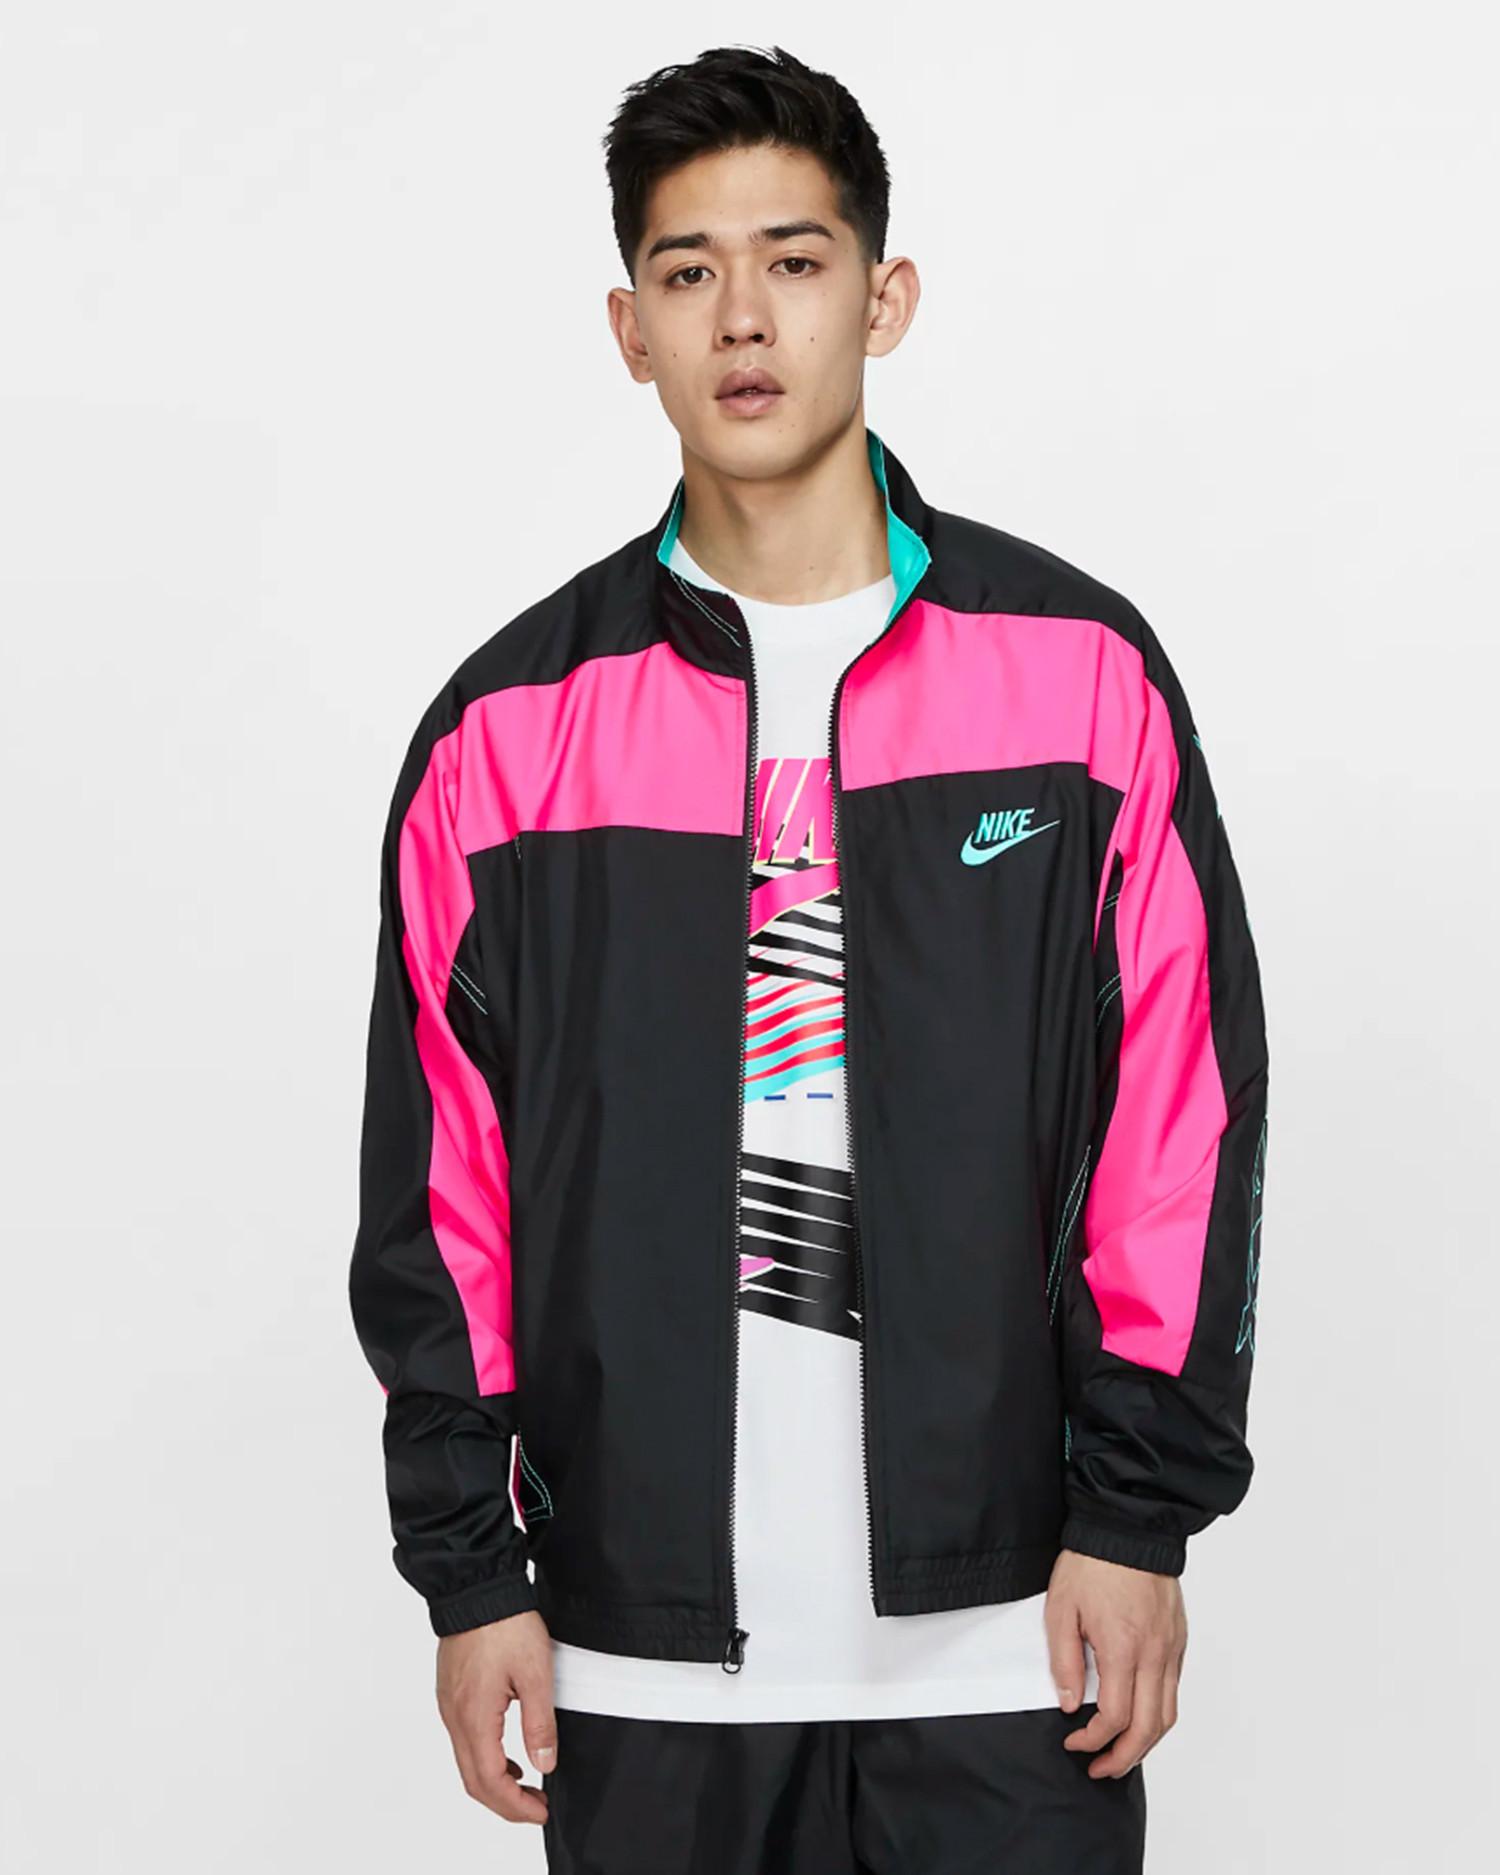 Nike x Atmos NRG VNTG Patchwork Tracktop Black/Hyper Pink/Hyper Jade